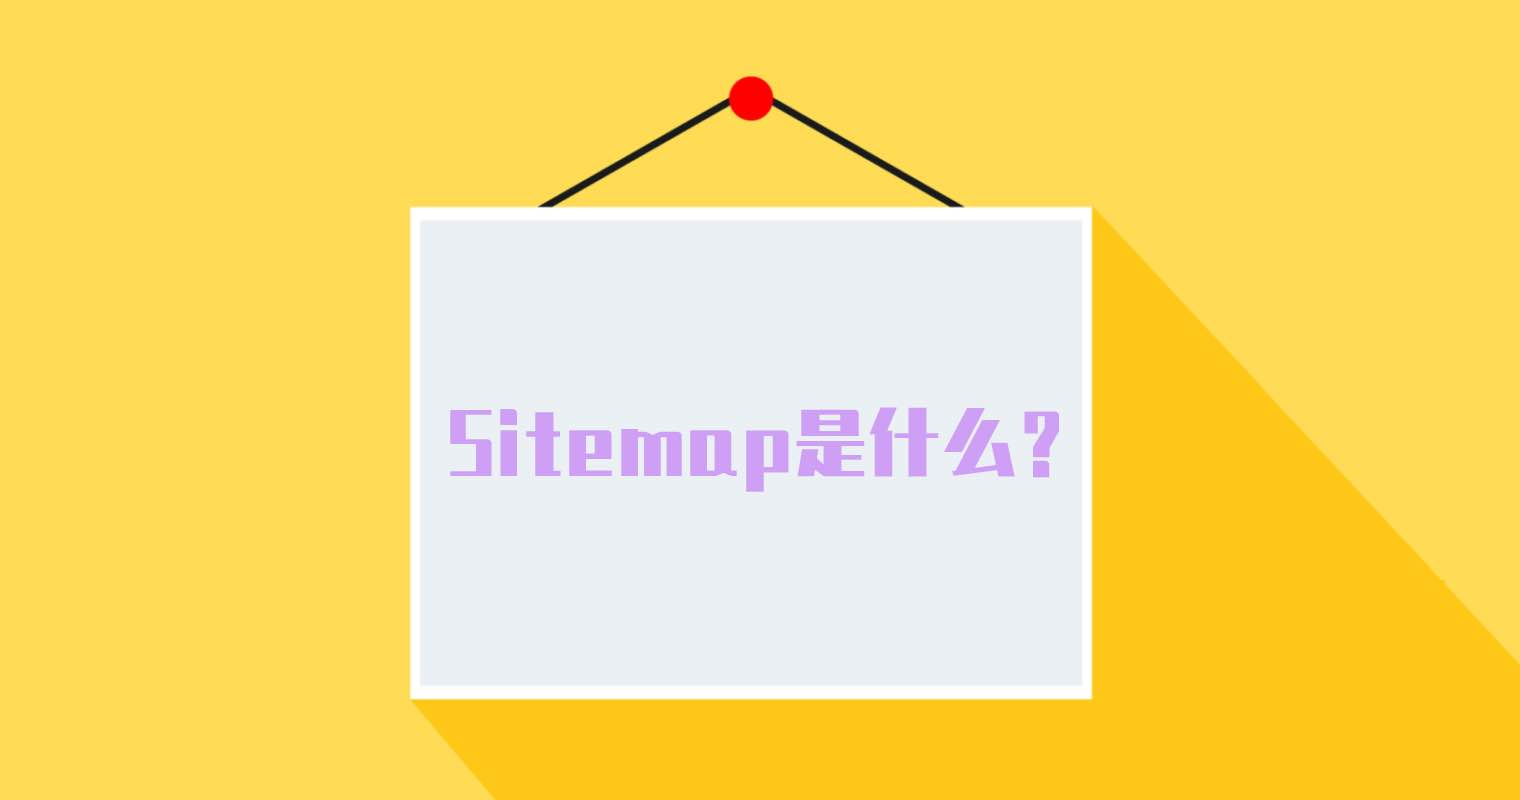 Sitemap是什么?